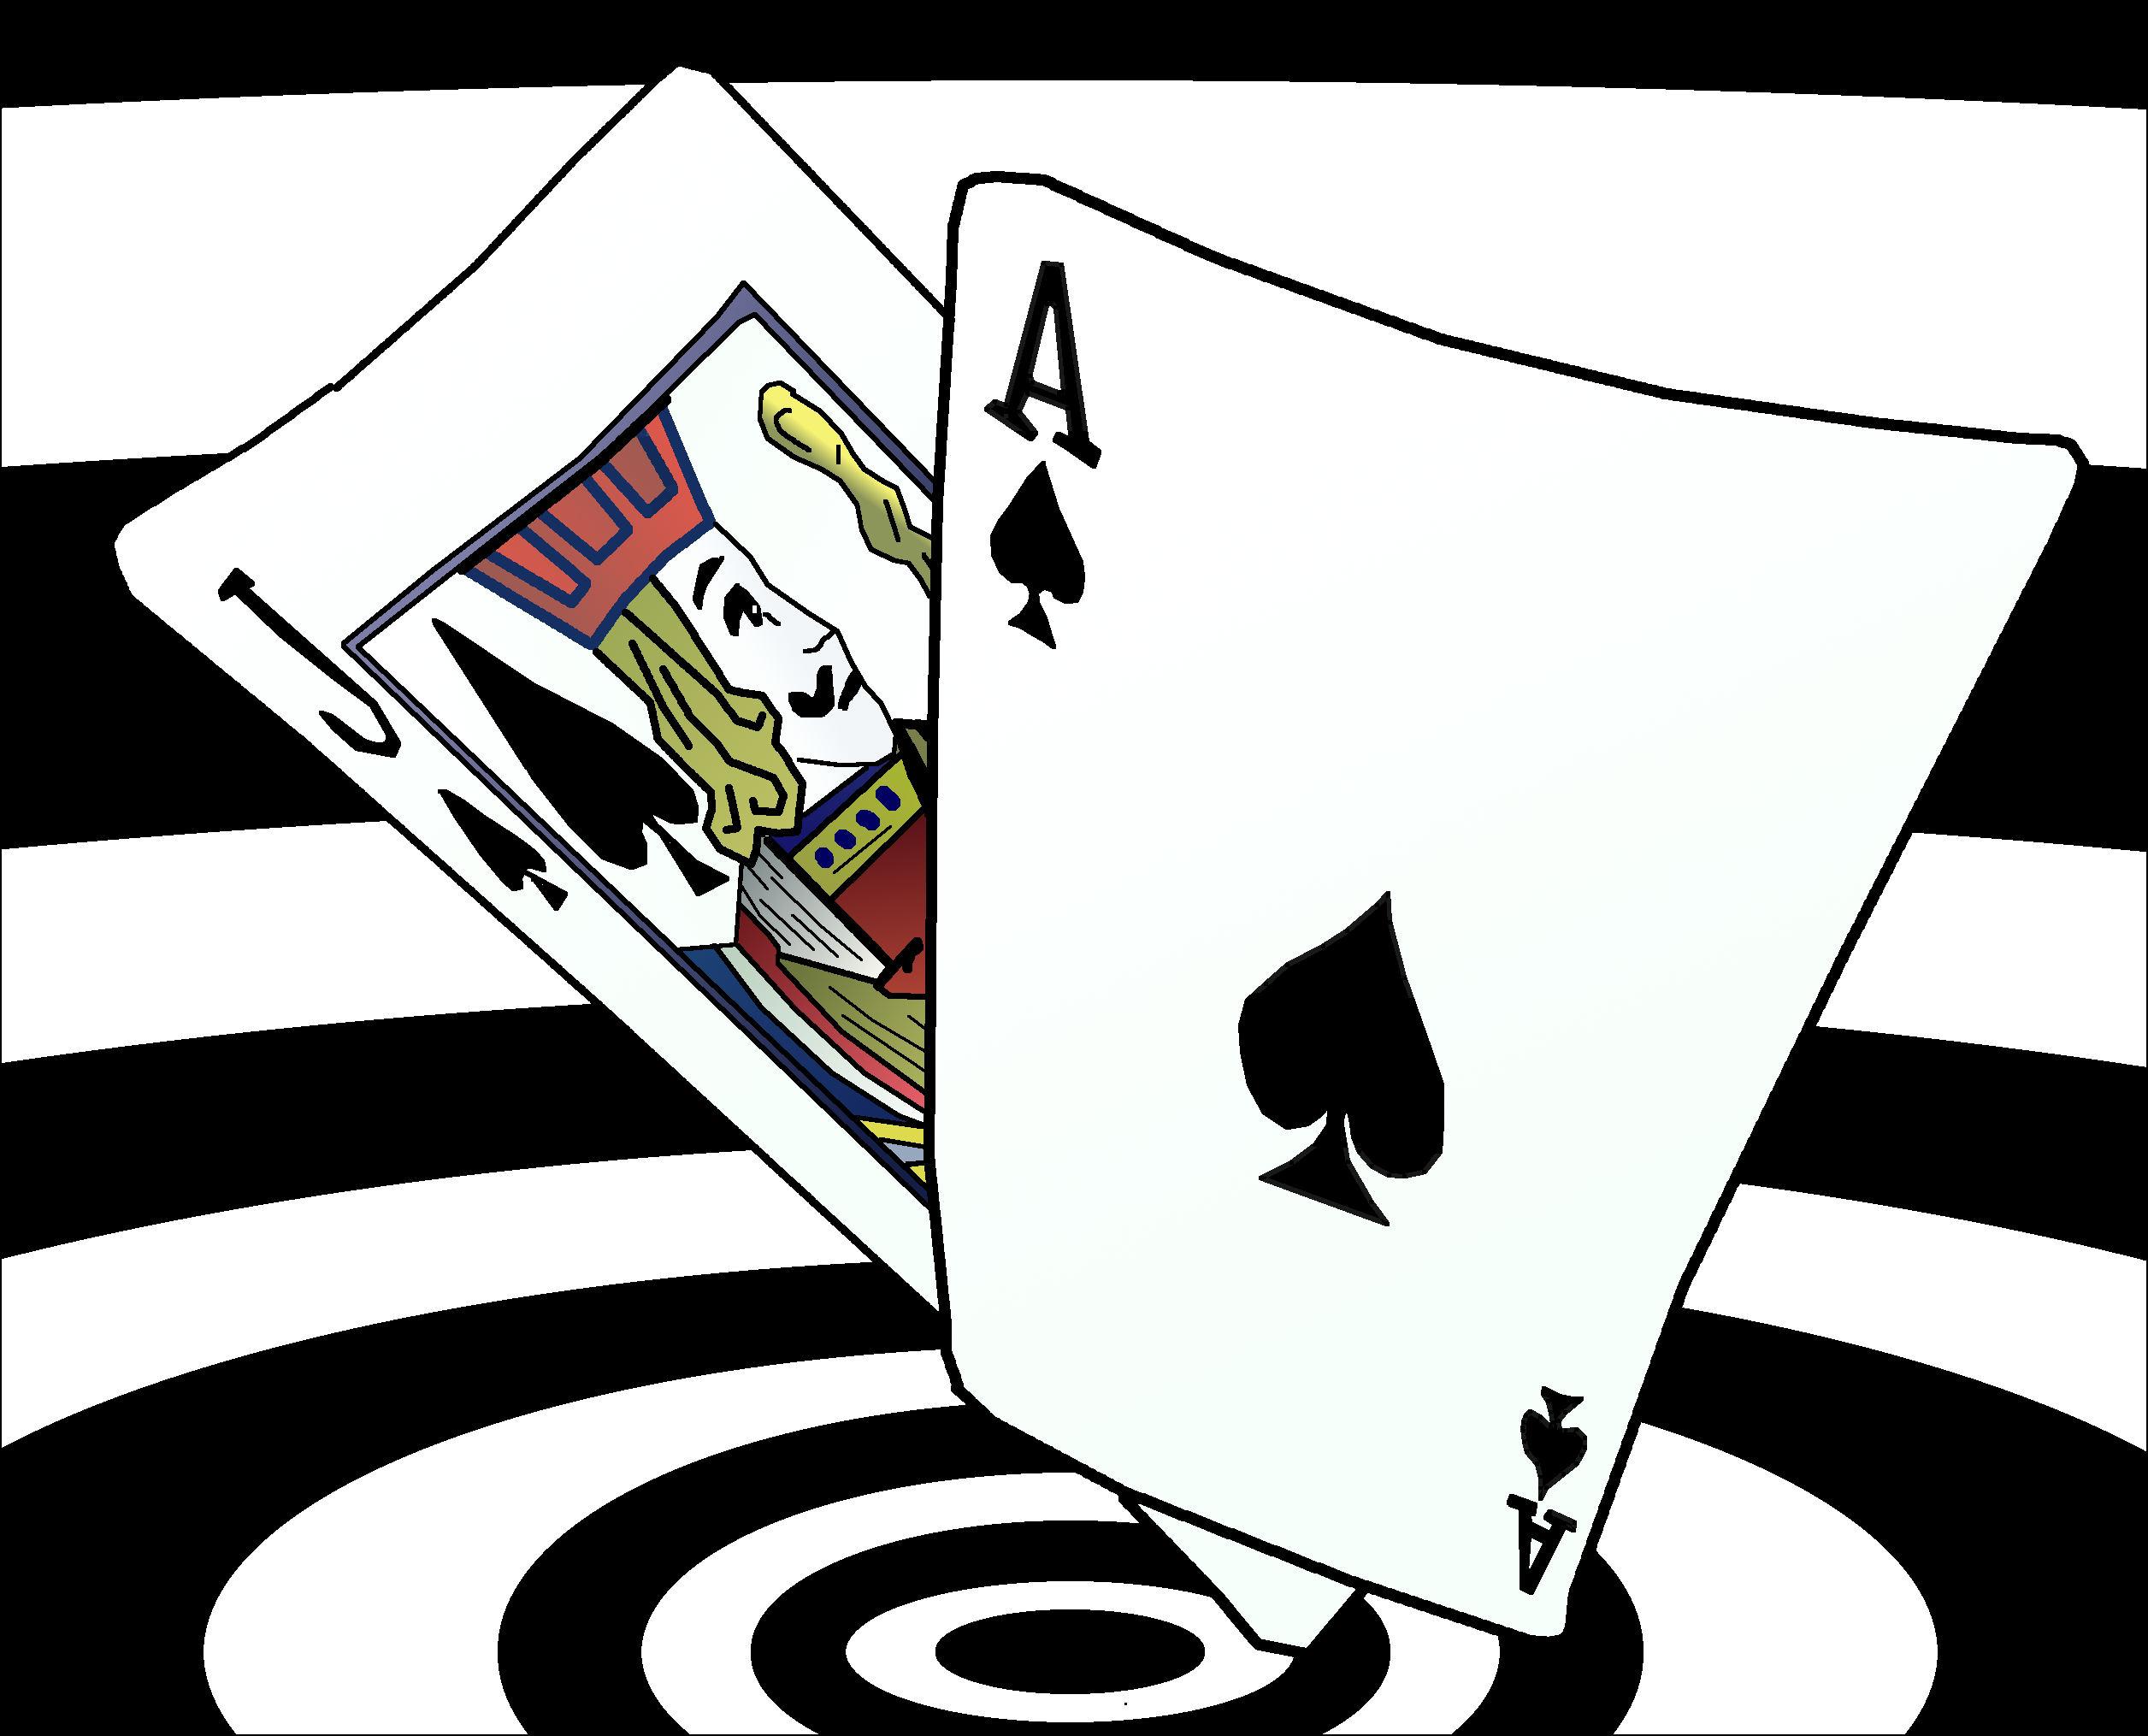 Chrono cross compass roulette